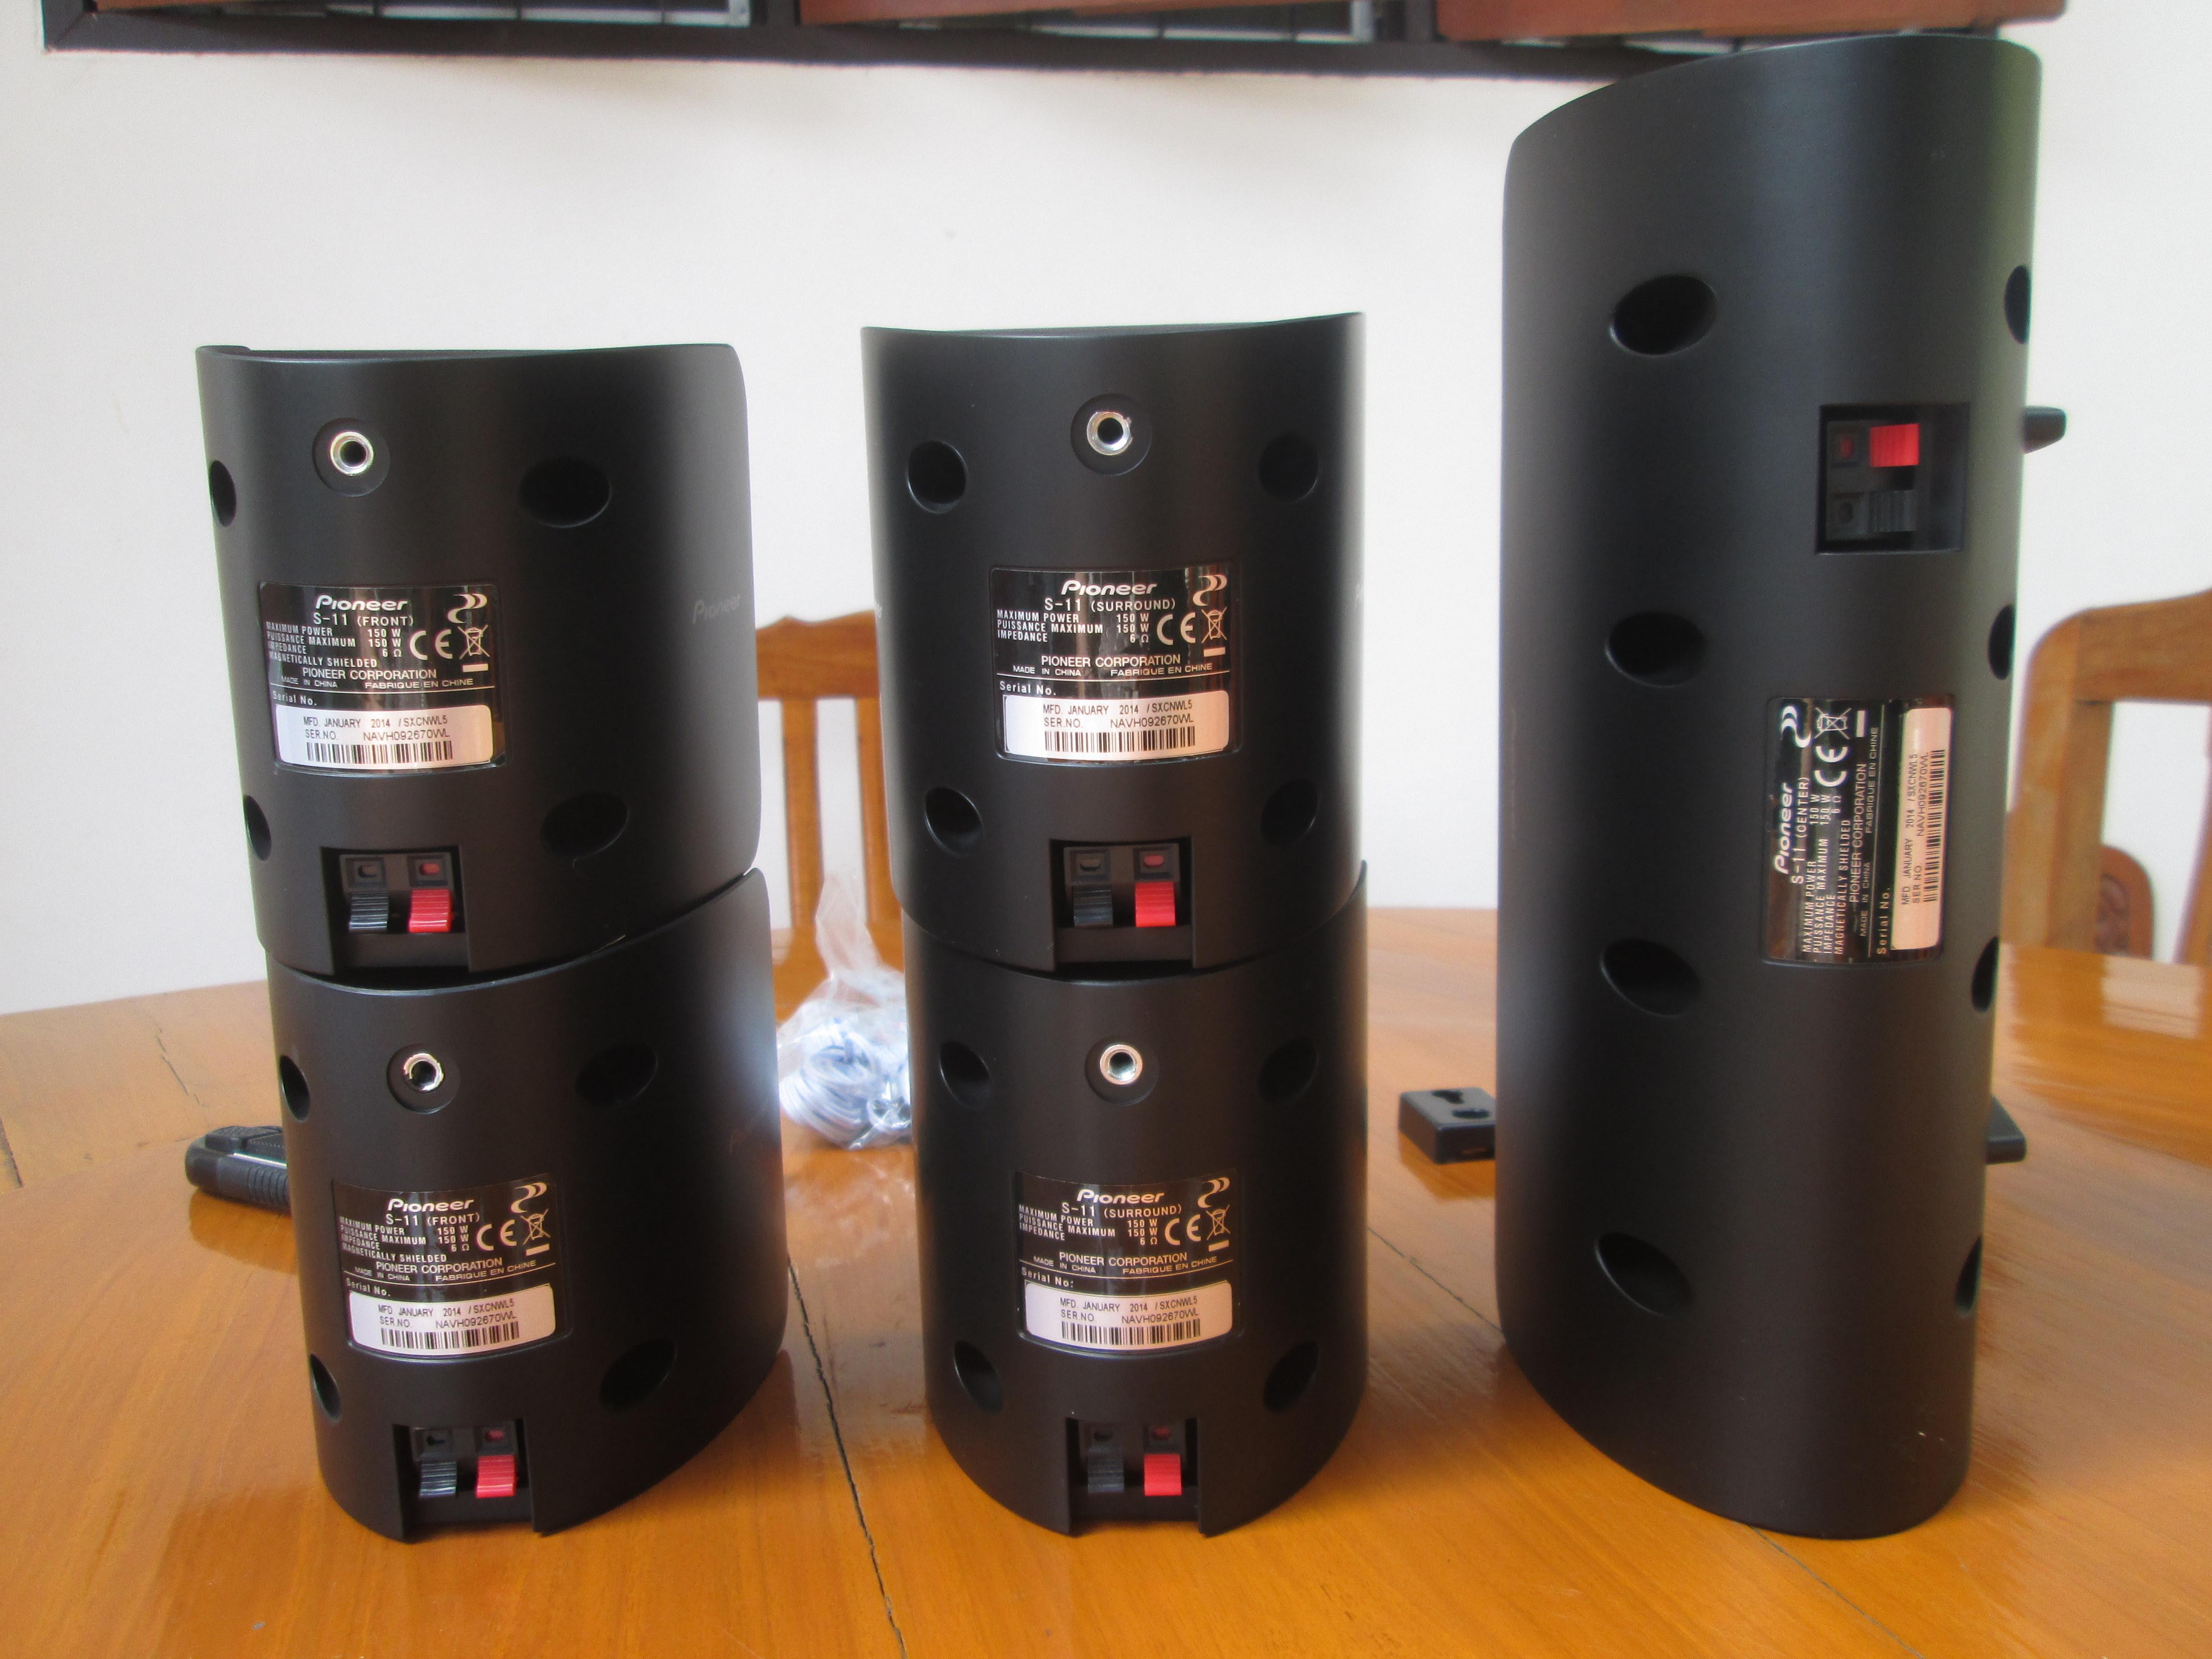 Onkyo TX-NR636 AV Receiver Setup and Audio Pass-through with